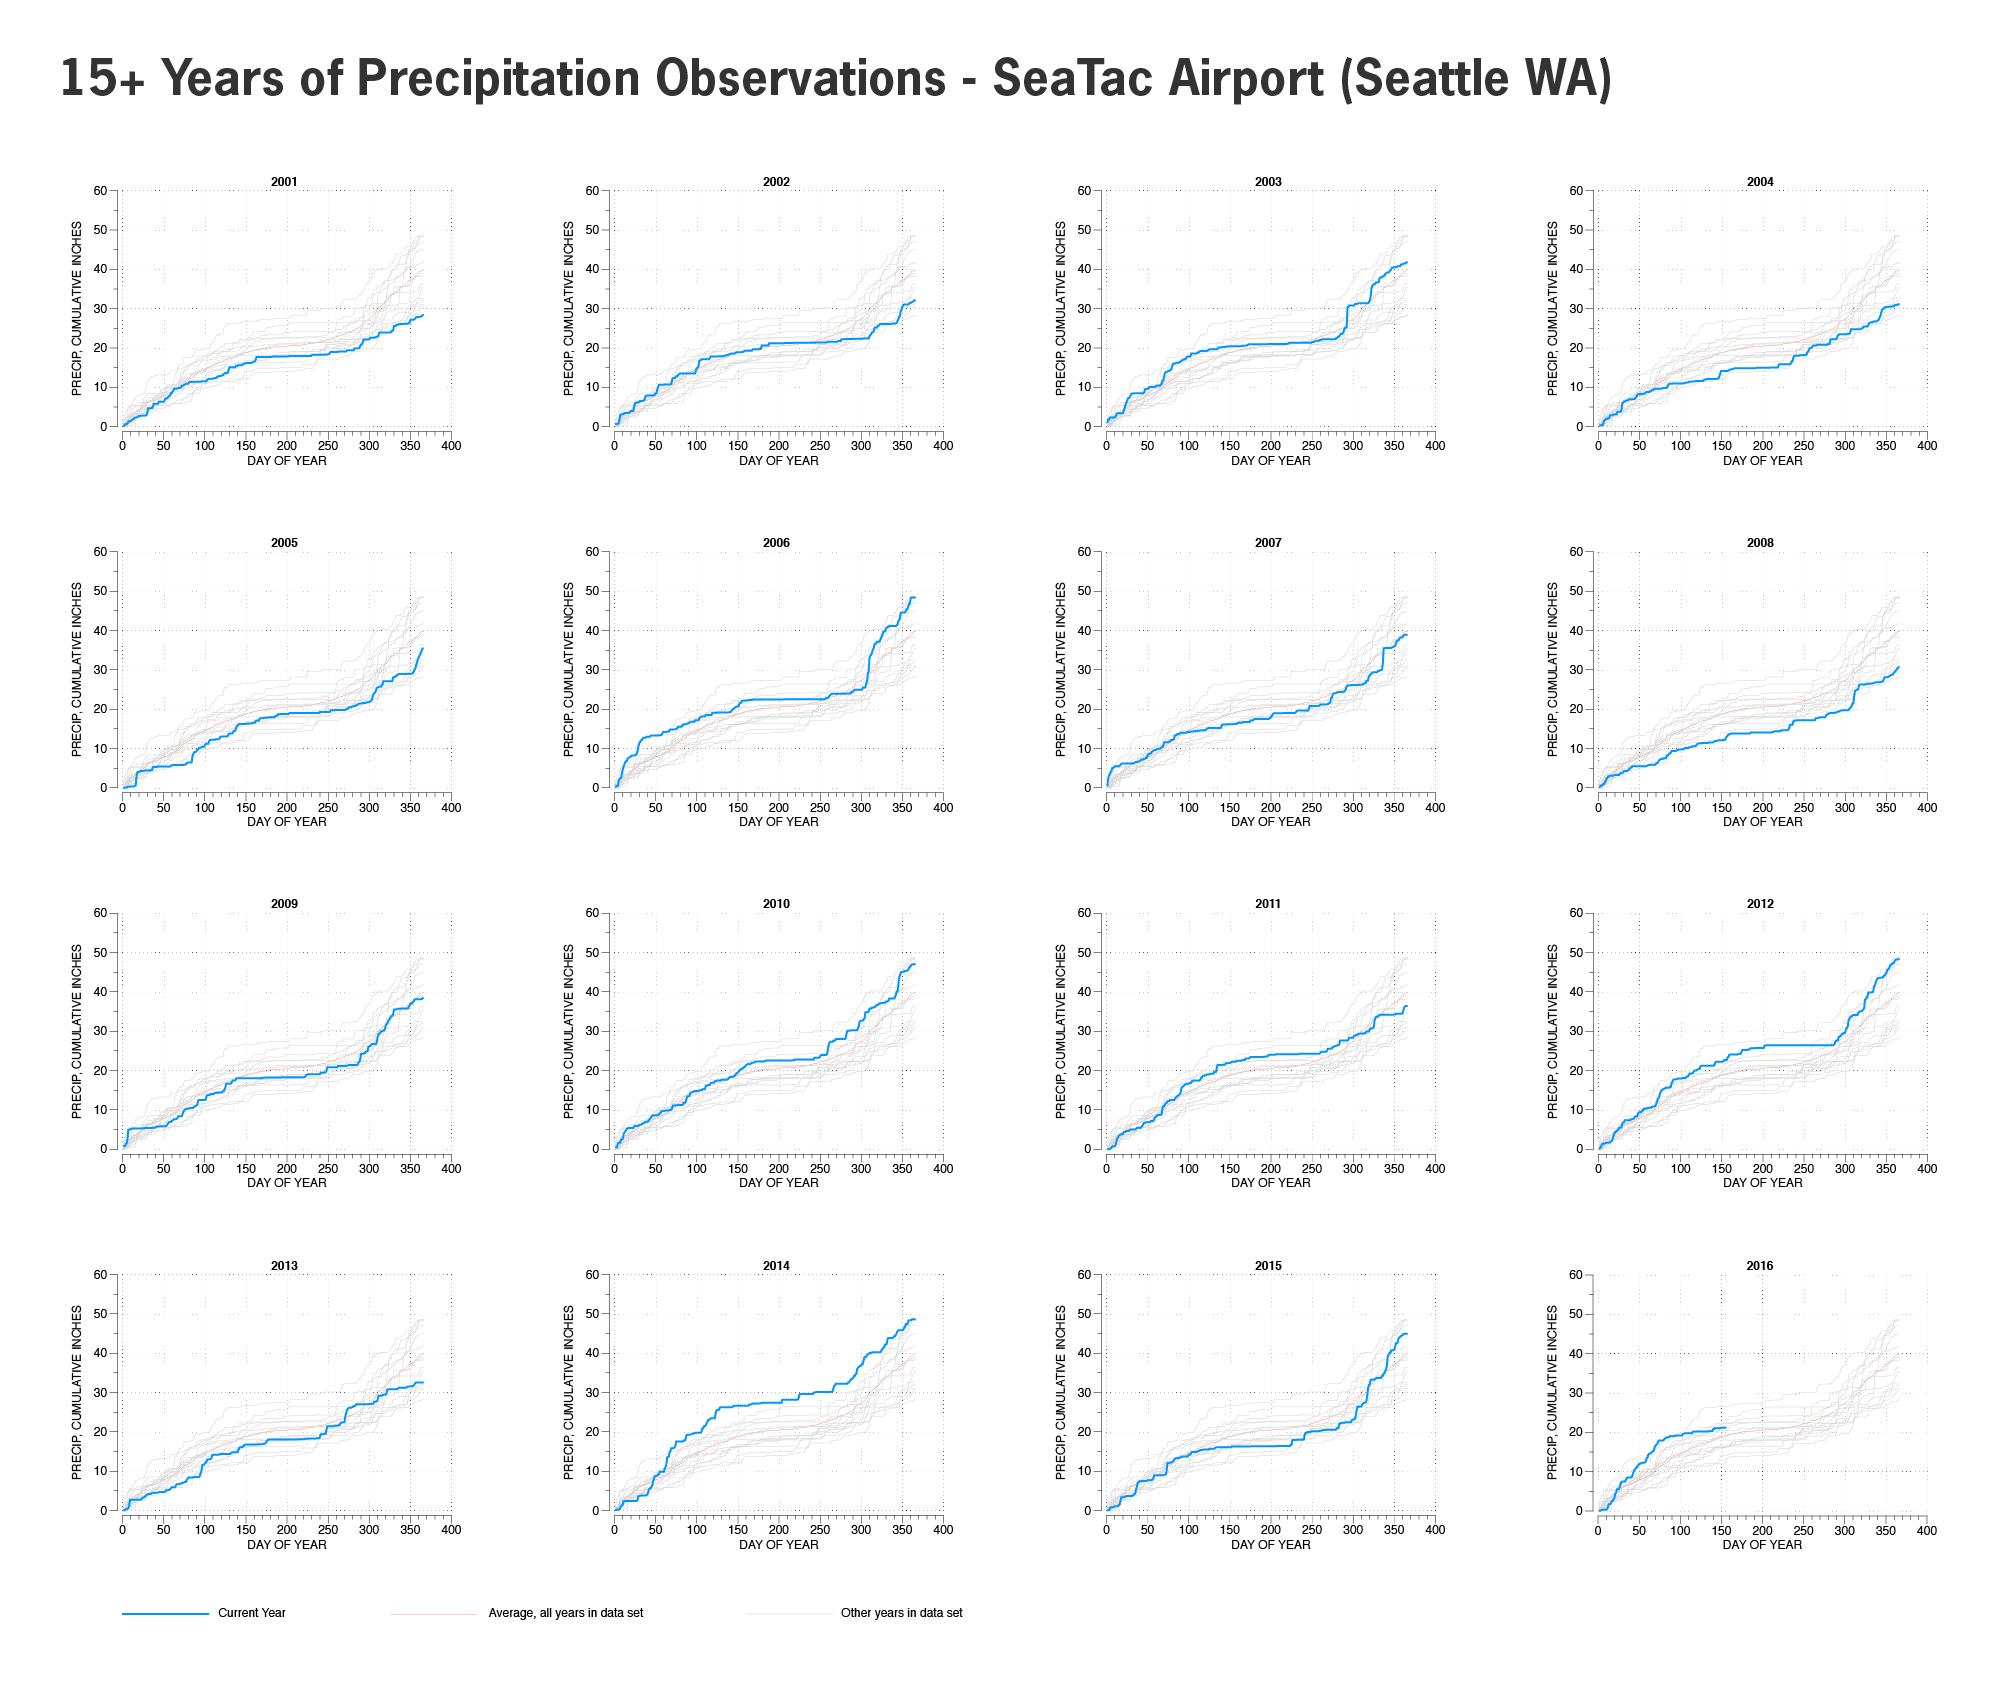 Accumulated precipitation by calendar year, Seattle.